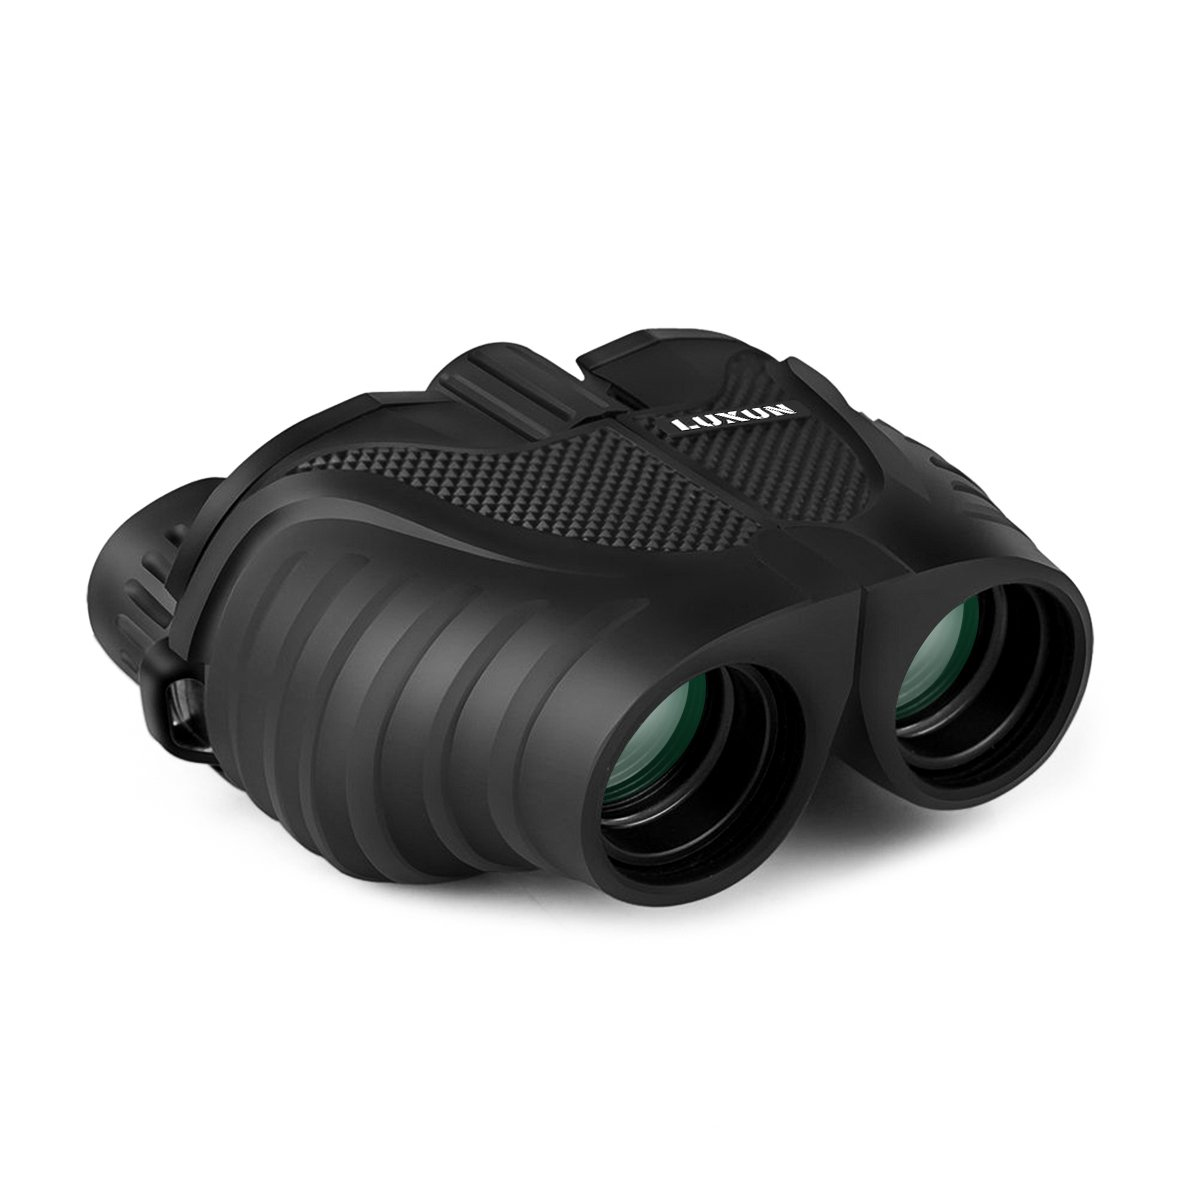 Compact Binoculars, SGODDE 8x25 Waterproof Folding High Powered Binoculars with Weak Light Night Vision,Fully Coated Lens for Outdoor Bird Watching Travelling Concert